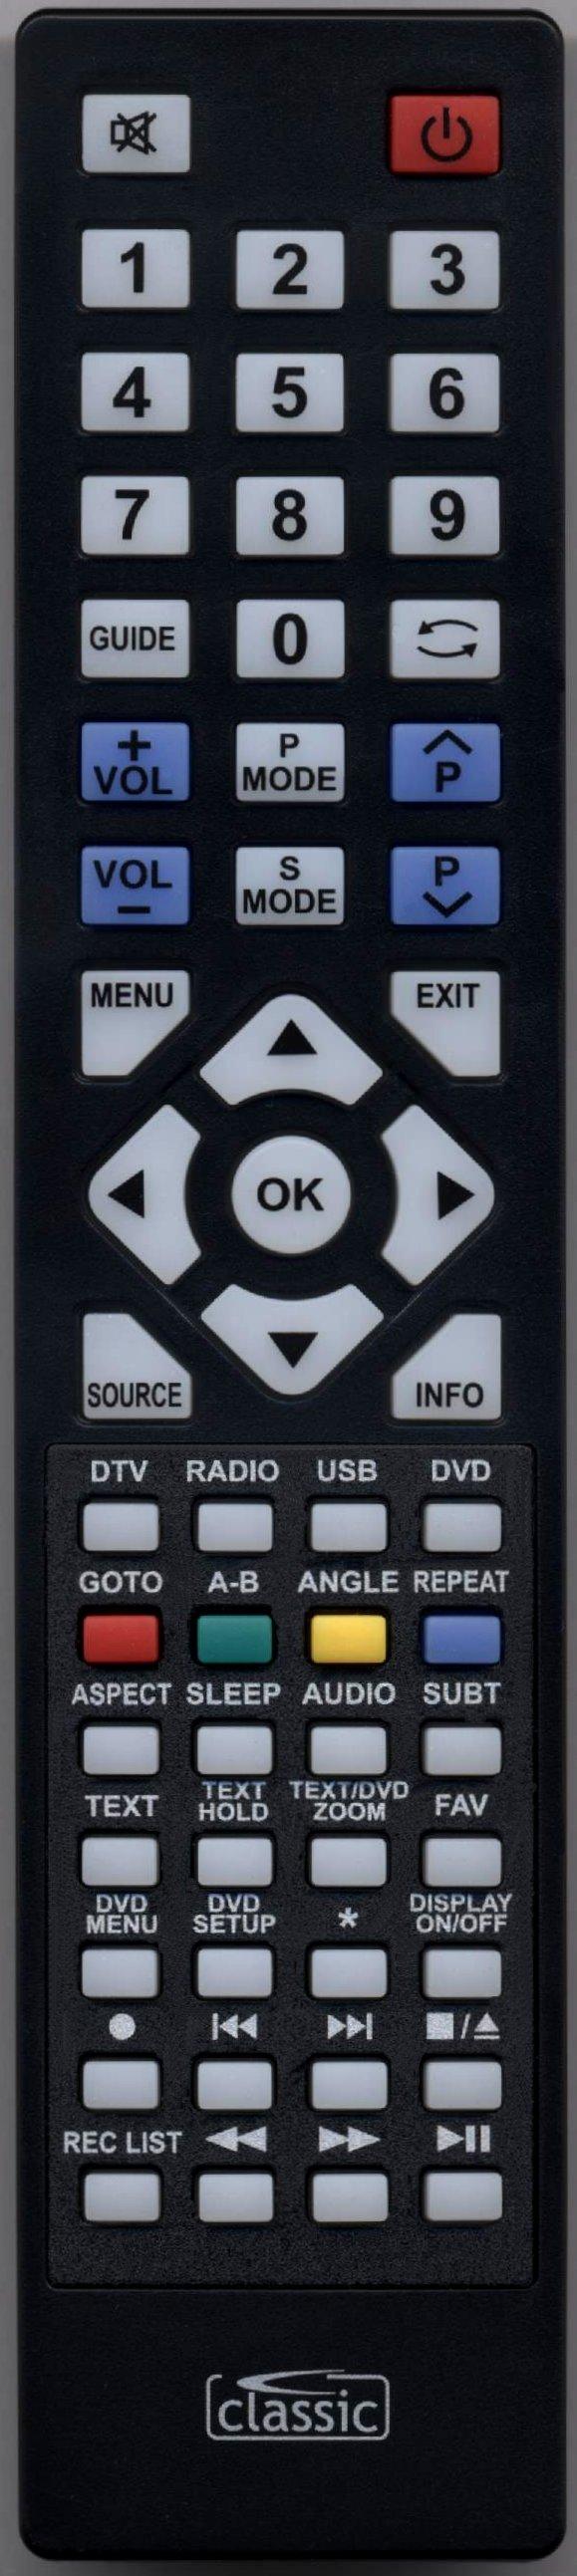 Blaupunkt 49/235Z-GB-11B-FGKU-UK Remote Control